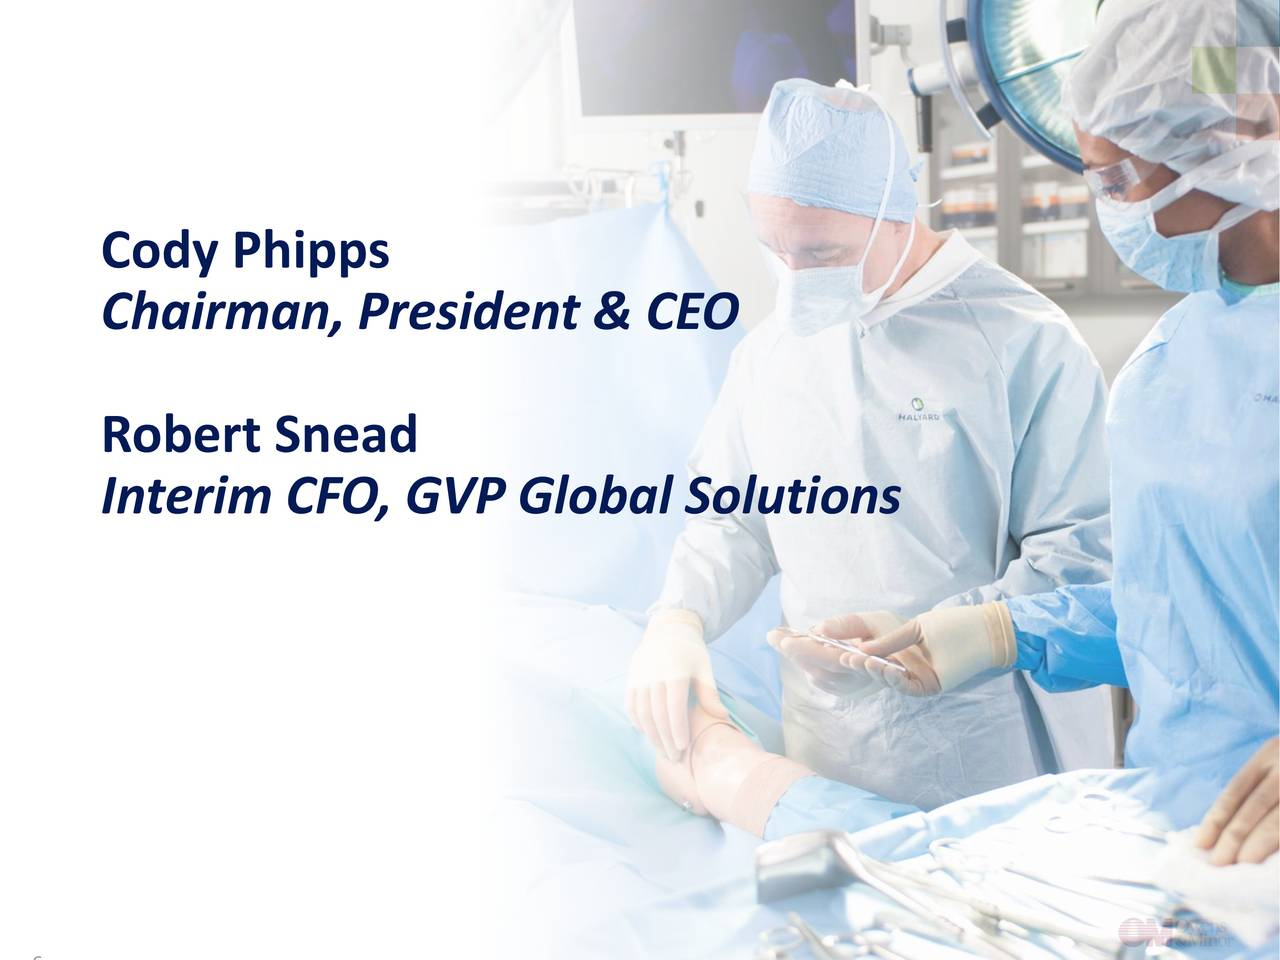 Chairman, President & CEO Robert Snead Interim CFO, GVP Global Solutions